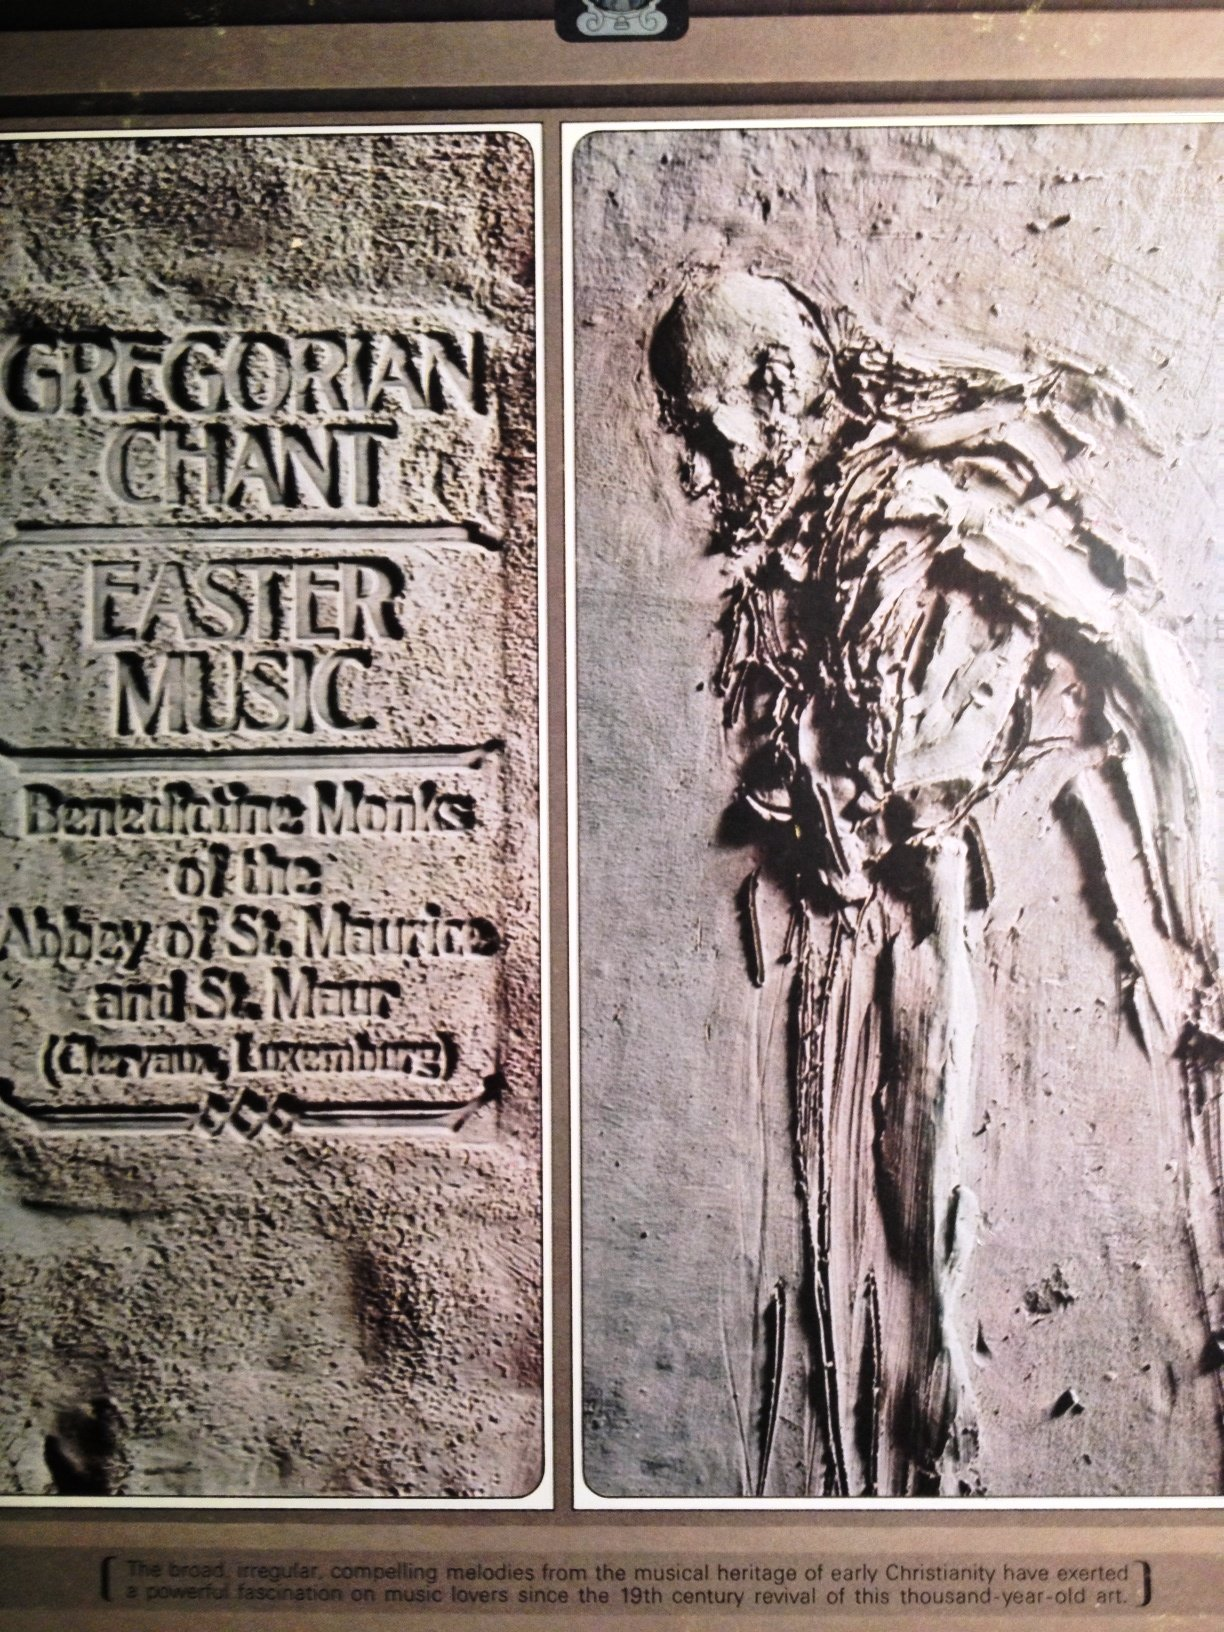 Gregorian Chant: Easter Music